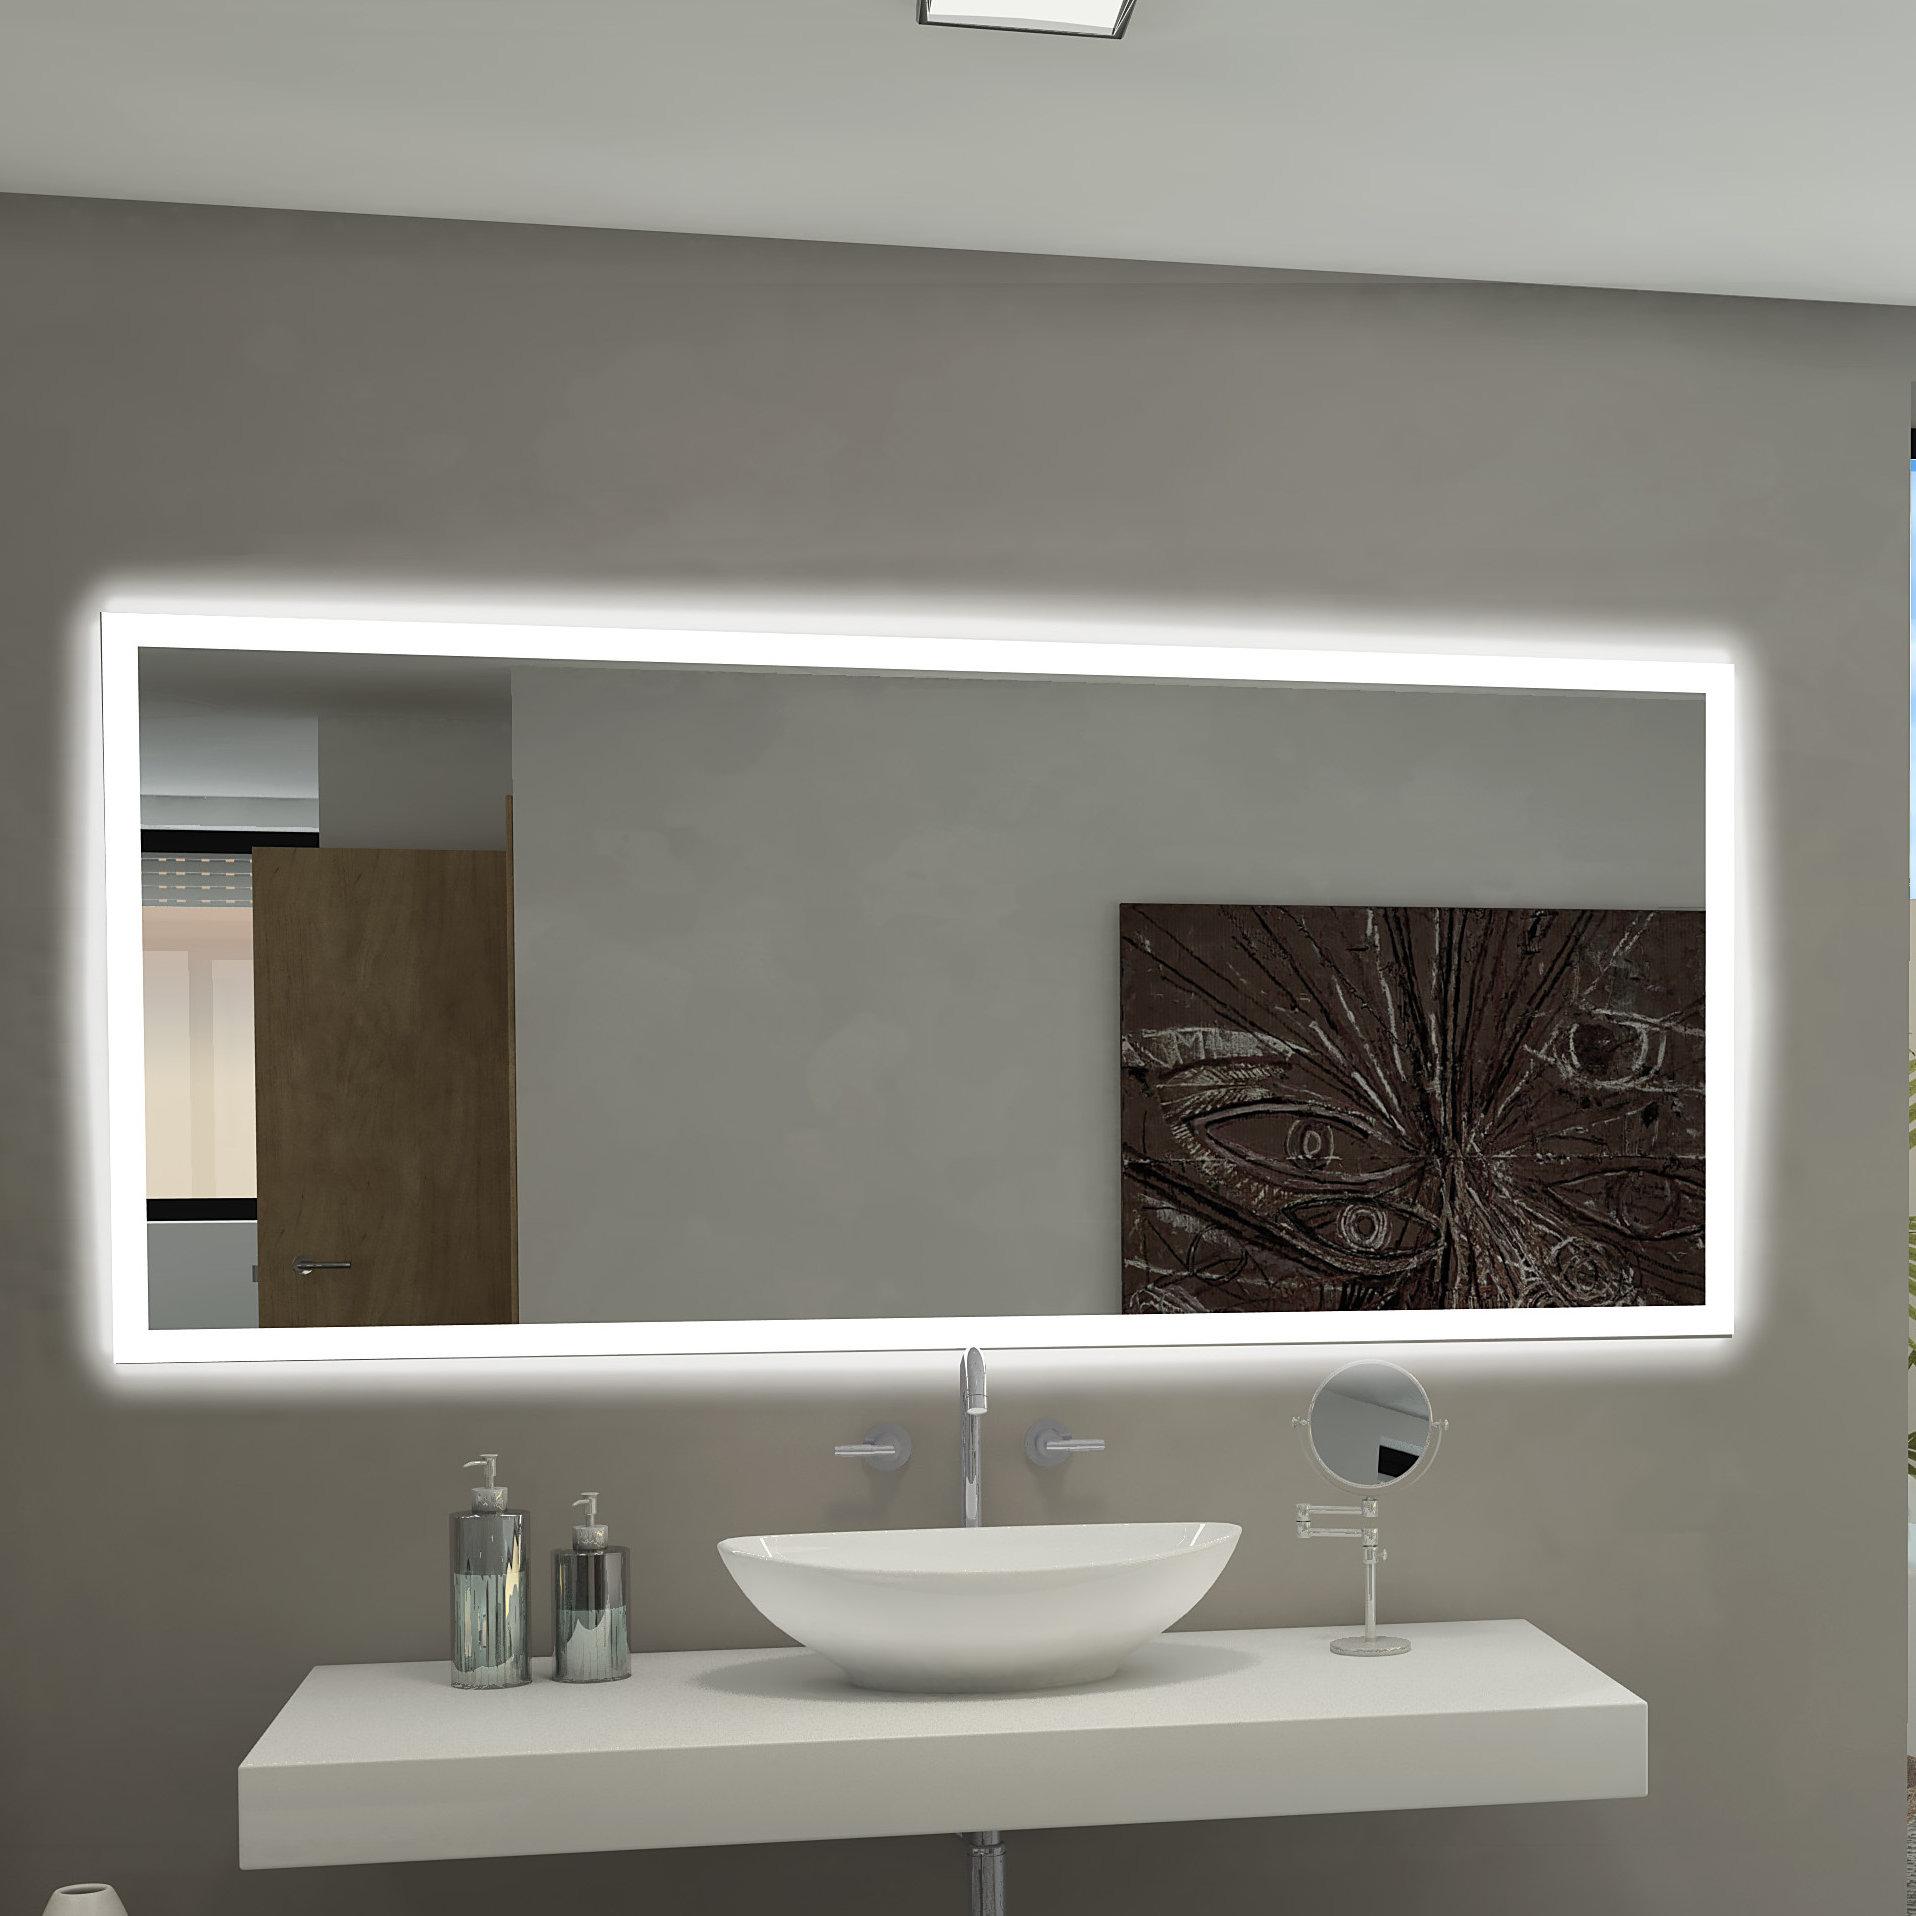 Charmant Paris Mirror Rectangle Backlit Bathroom/Vanity Wall Mirror U0026 Reviews    Wayfair